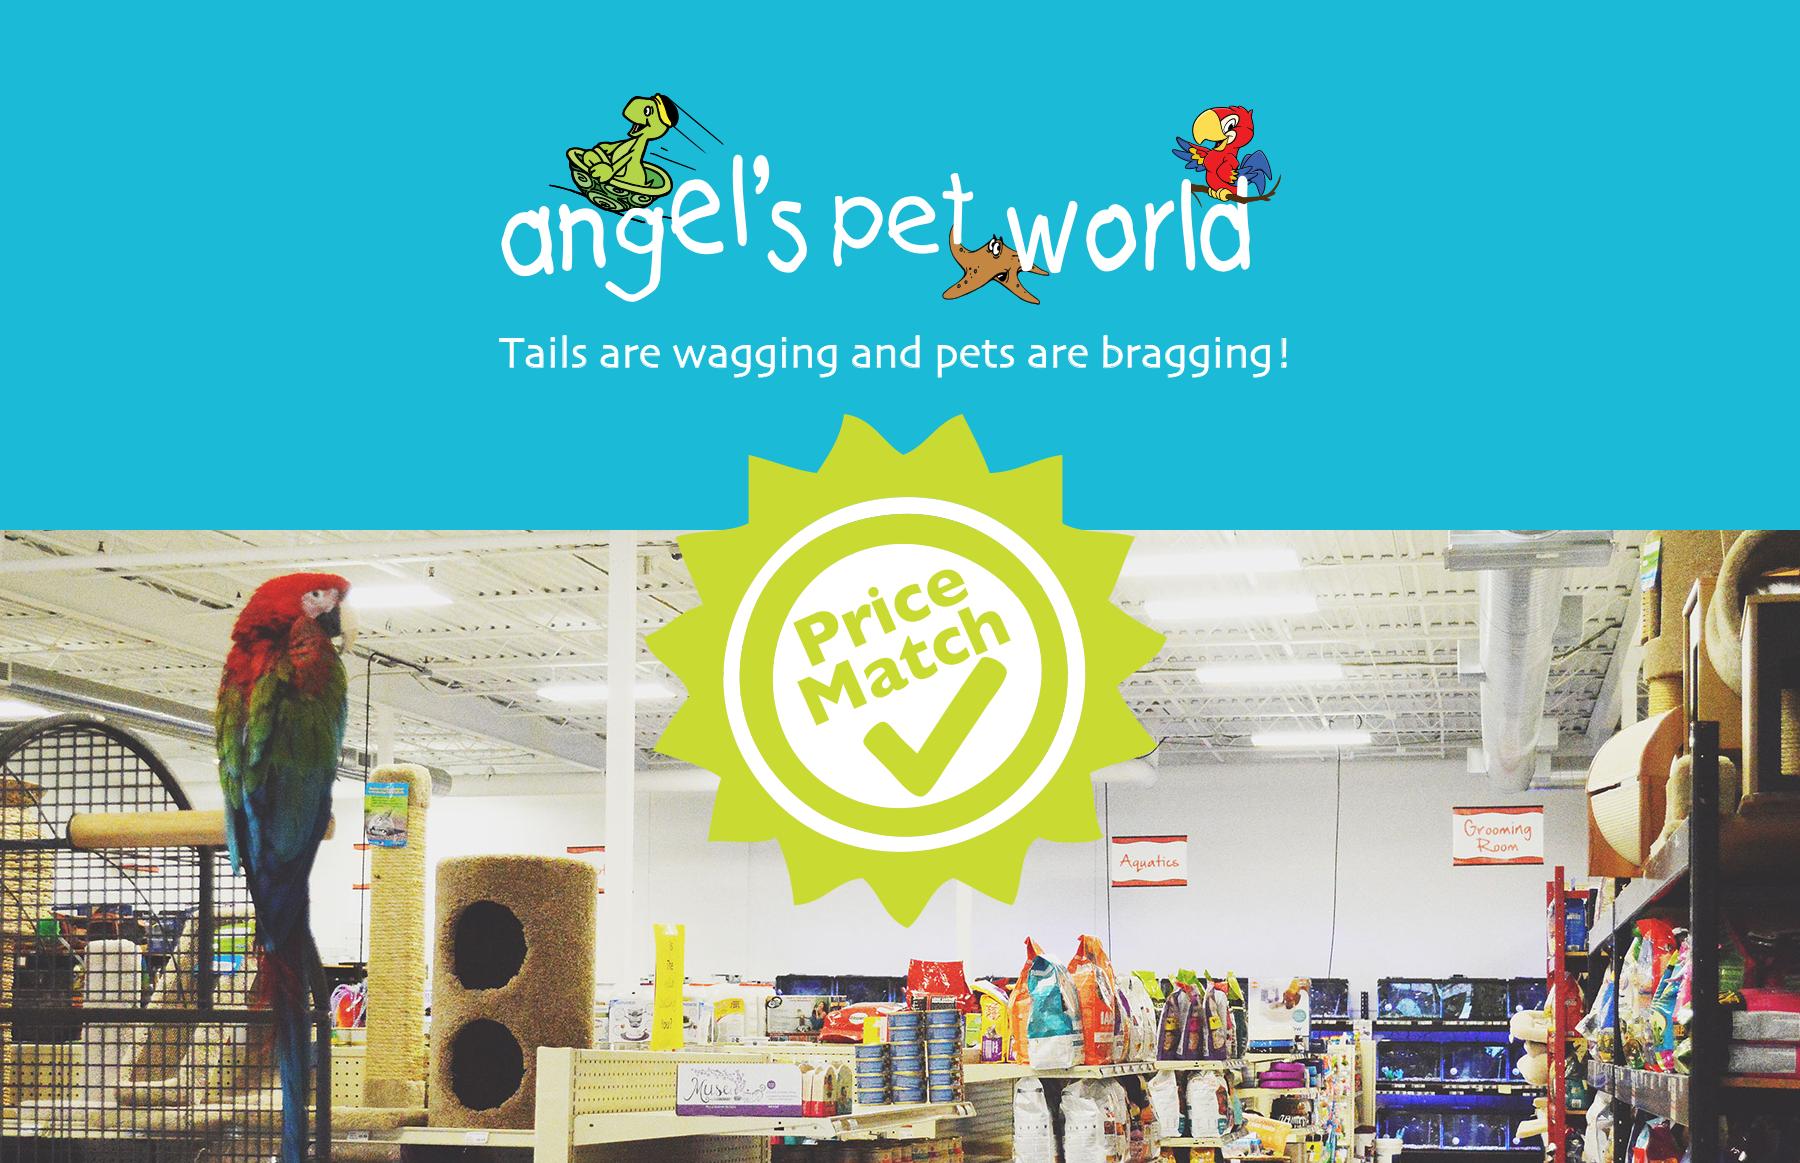 price-match-angels-pet-world-pet-supply-hudson-angels-pet-world